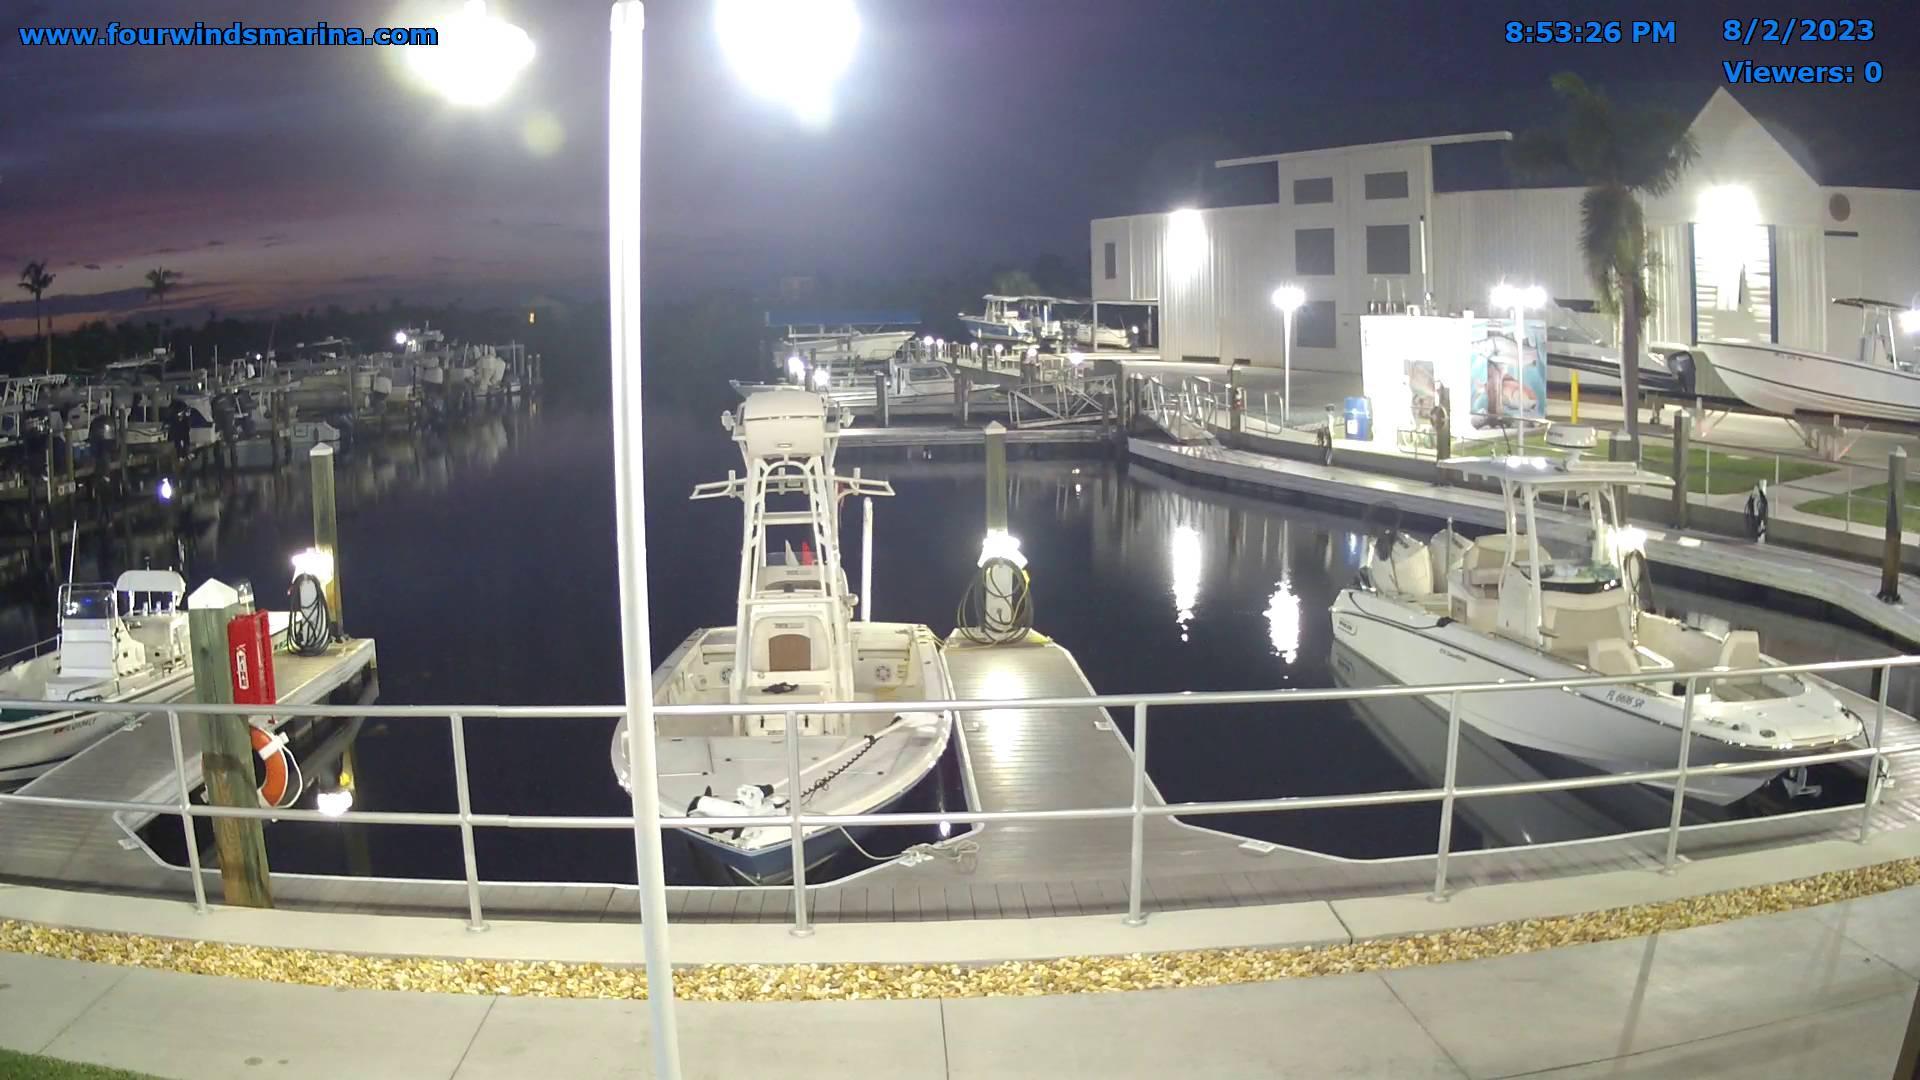 Webcam Bokeelia: Four Winds Marina − Pine Island